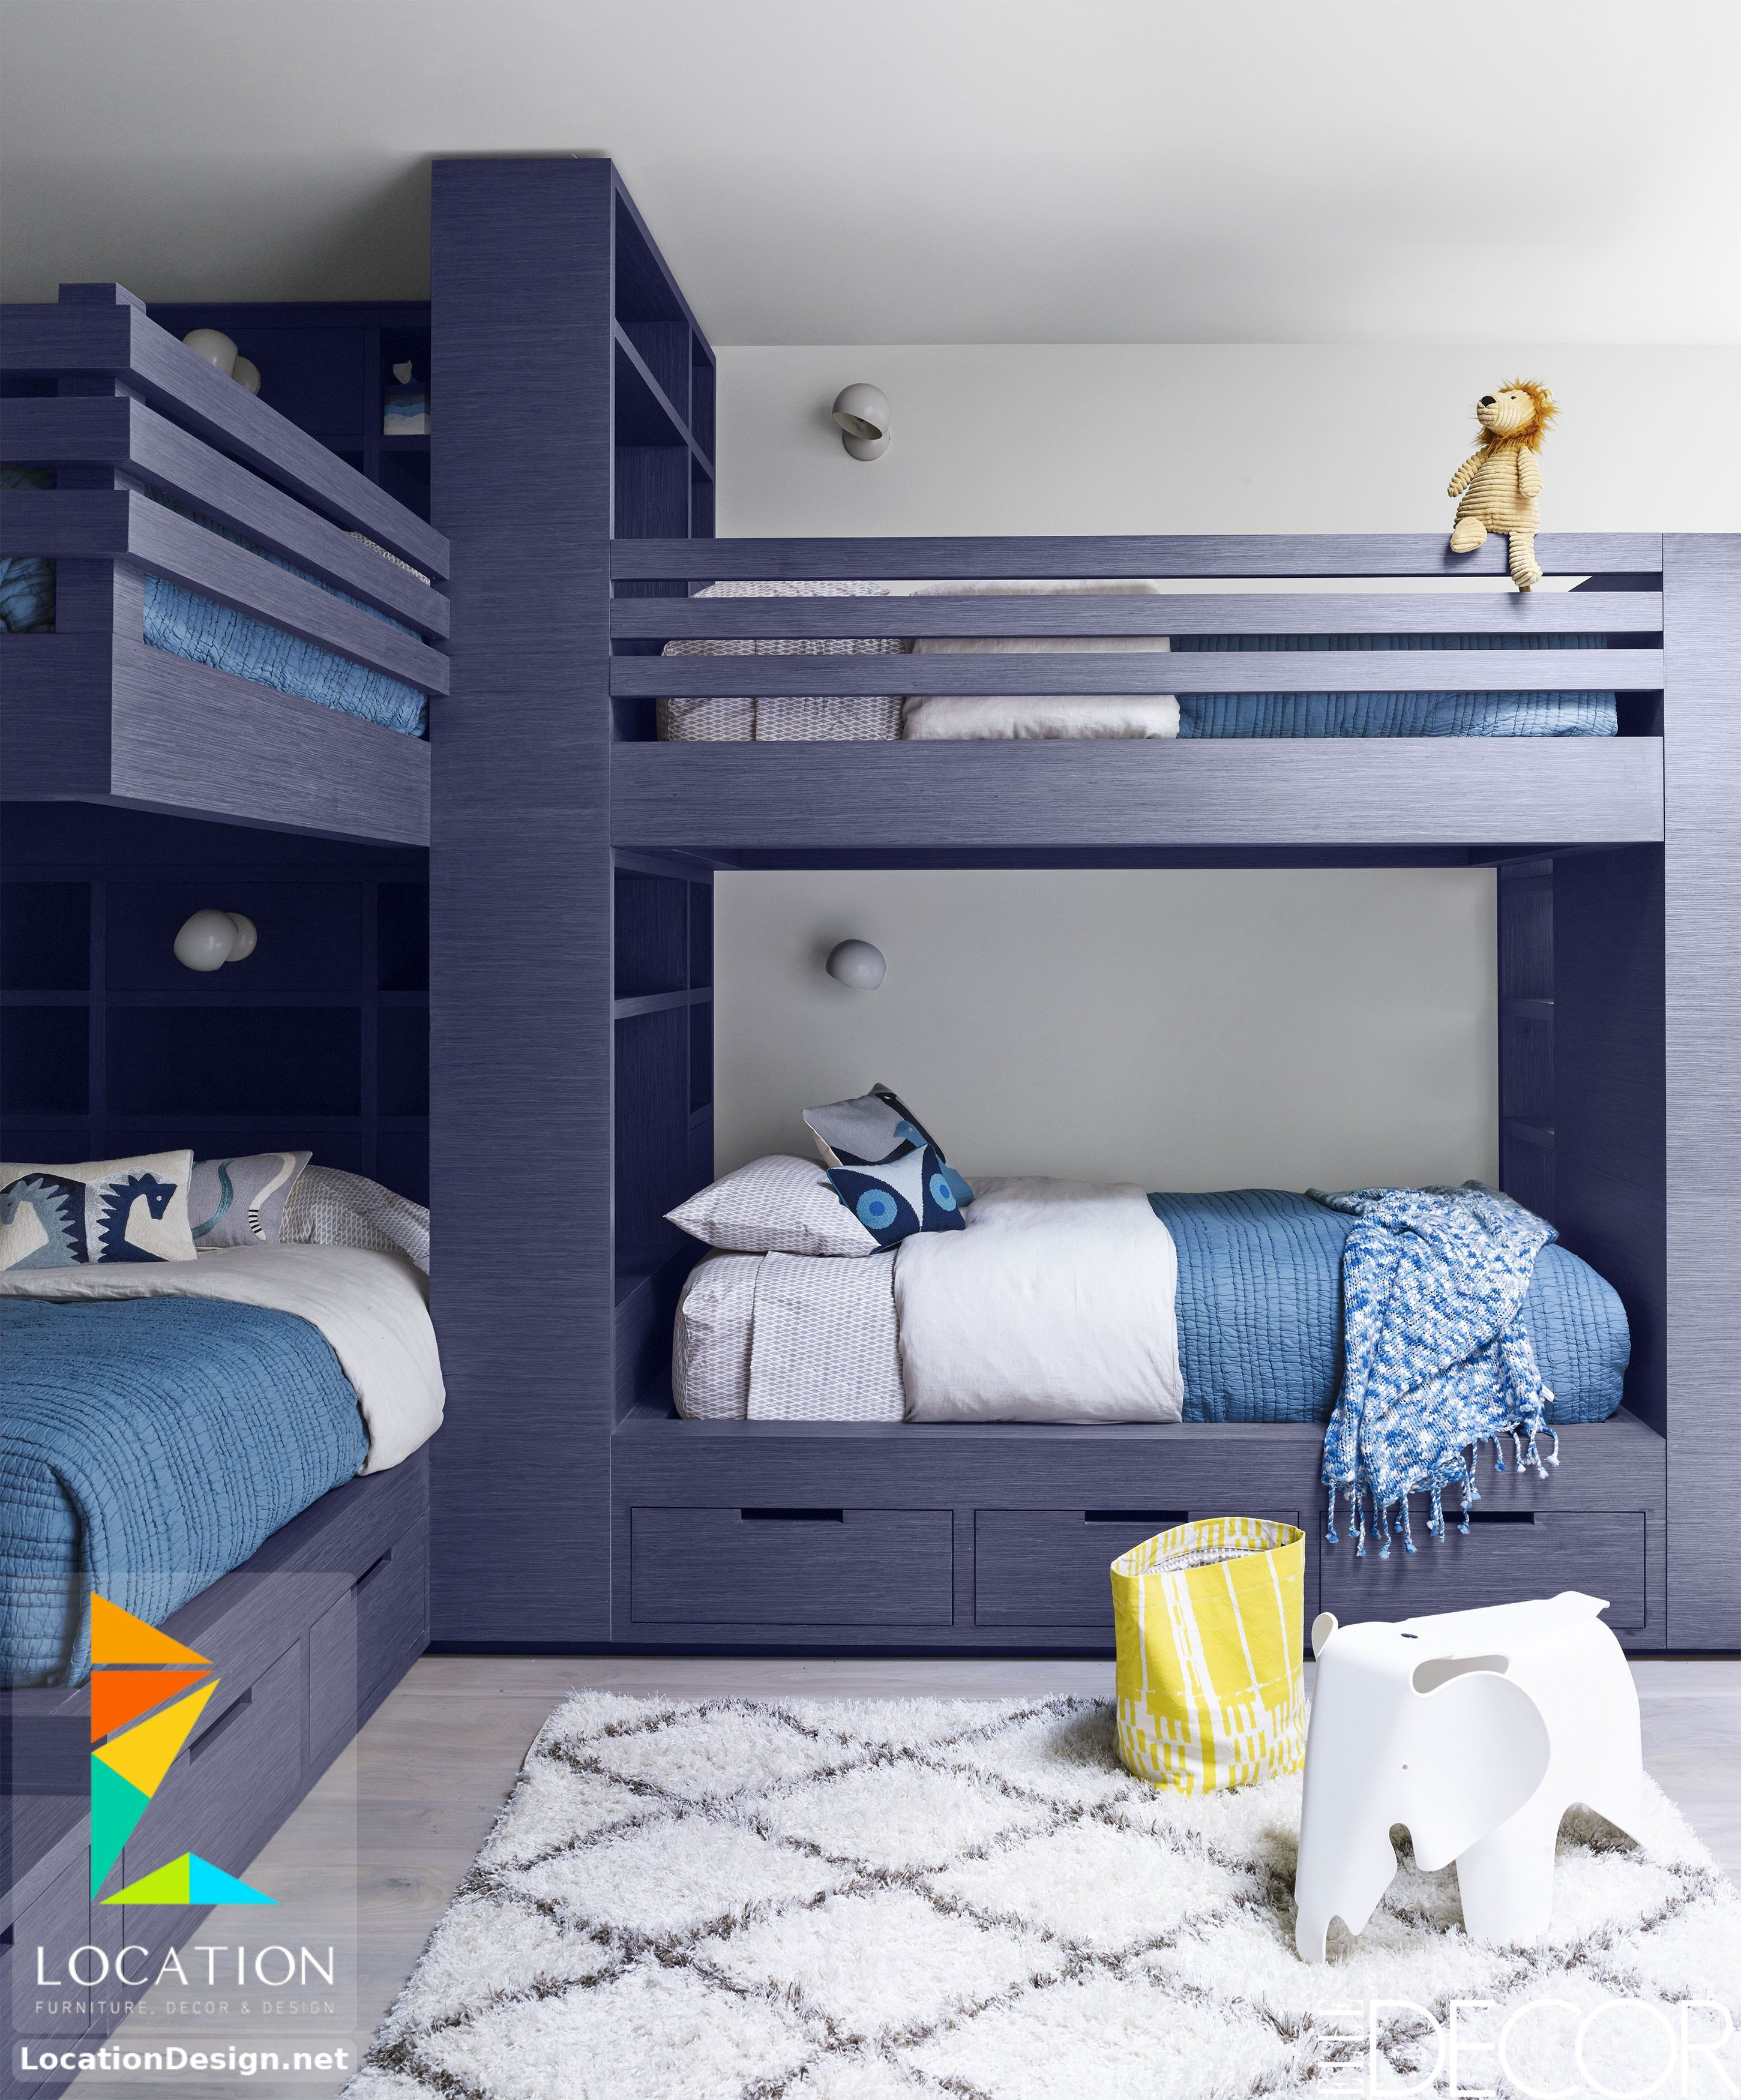 غرف نوم اولاد شباب أحدث موديلات غرف شبابي مودرن لوكشين ديزين نت Cool Bedrooms For Boys Blue Bedroom Decor Boy Bedroom Design